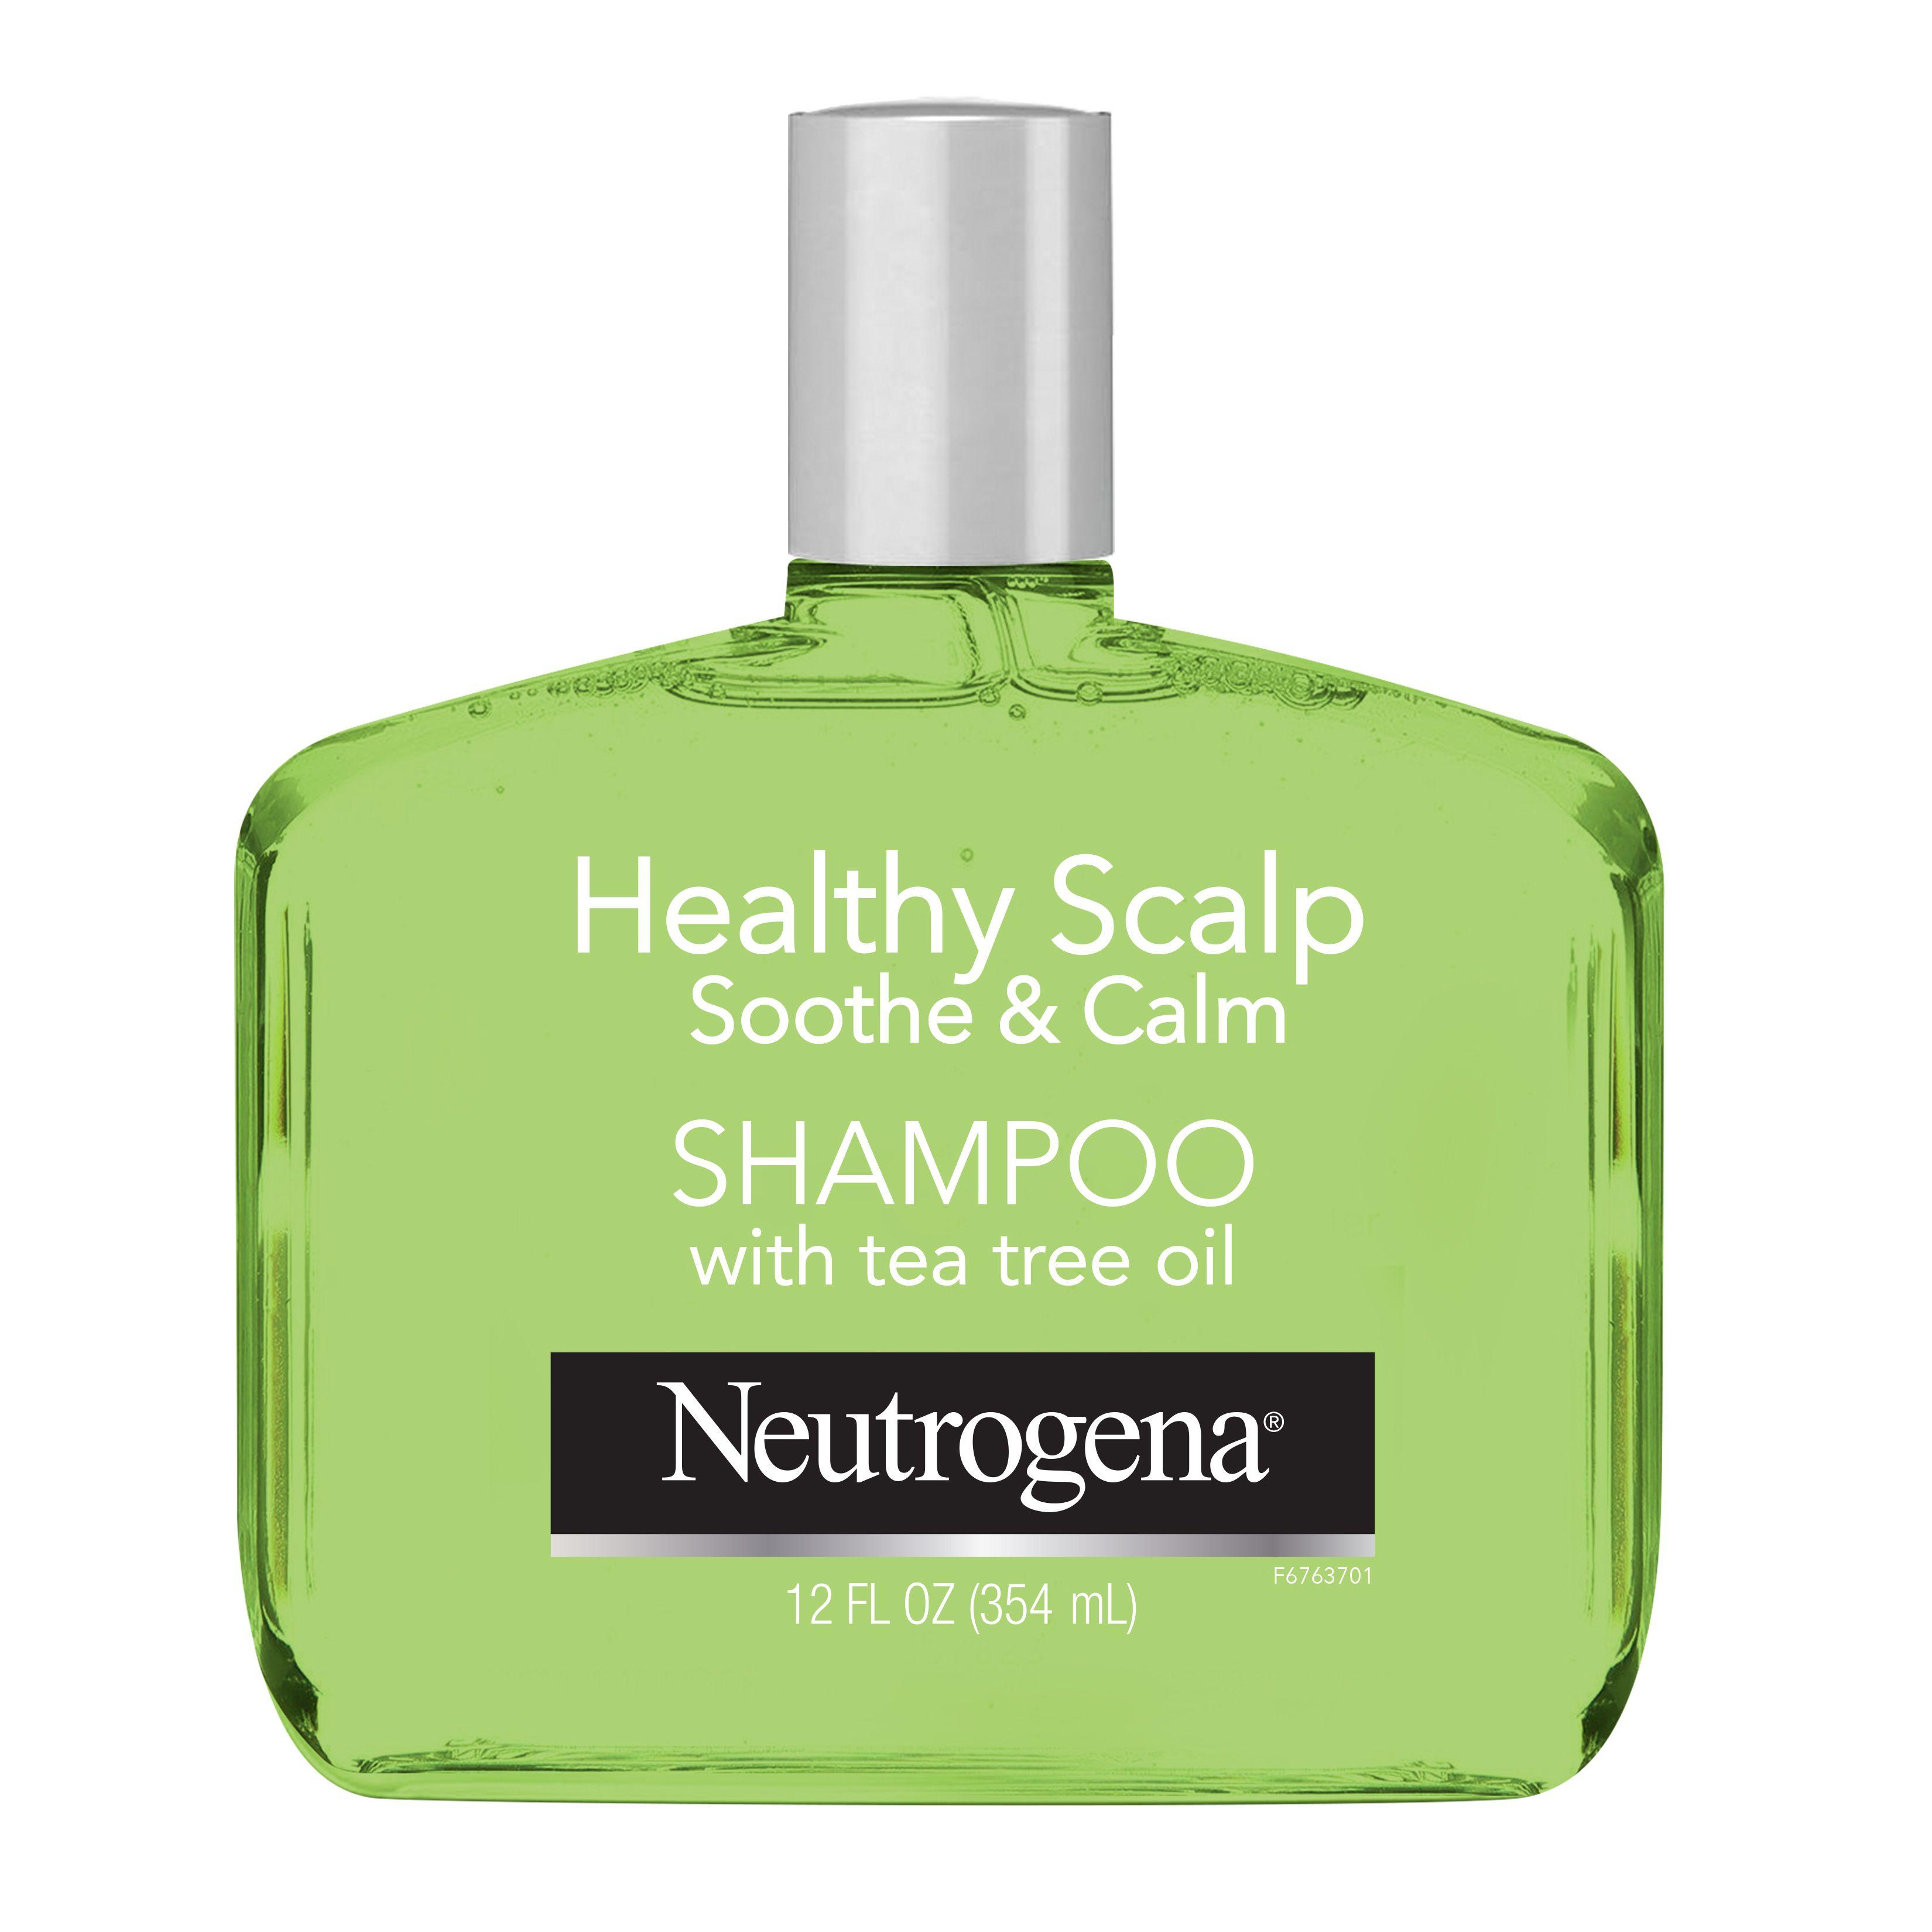 Neutrogena Tea Tree Oil Shampoo To Refresh Moisturize Dry Scalp Hair Healthy Scalp Soothe Calm Sulfate Free Surfactants Color Safe 12 Fl Oz Walmart Tea Tree Oil Shampoo Scalp